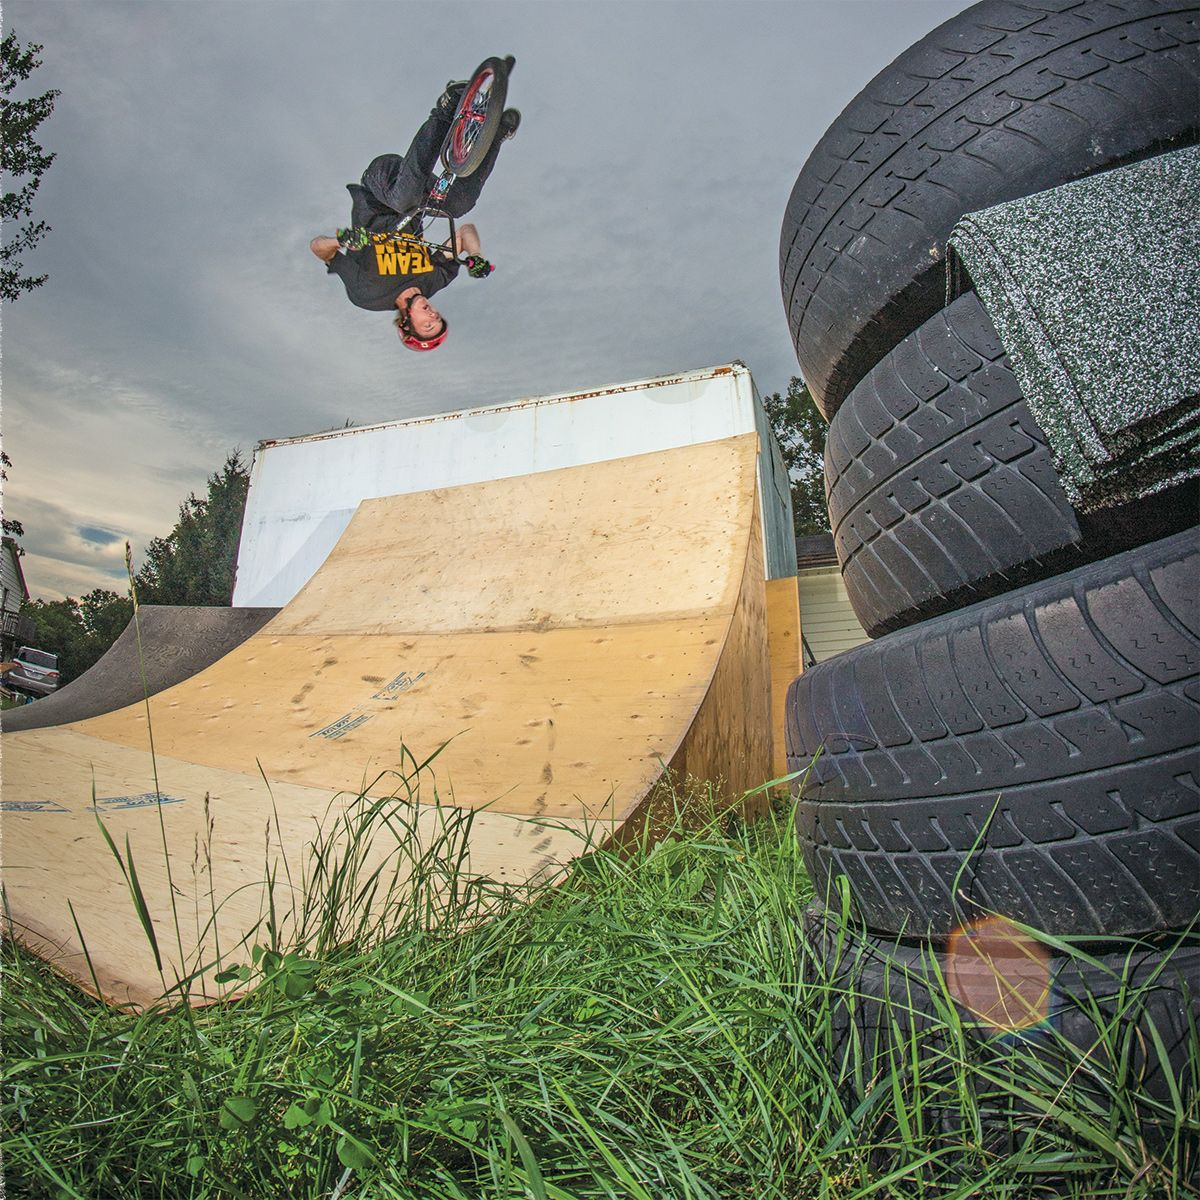 bmx rider cody fry backyard flair photo credit to brody